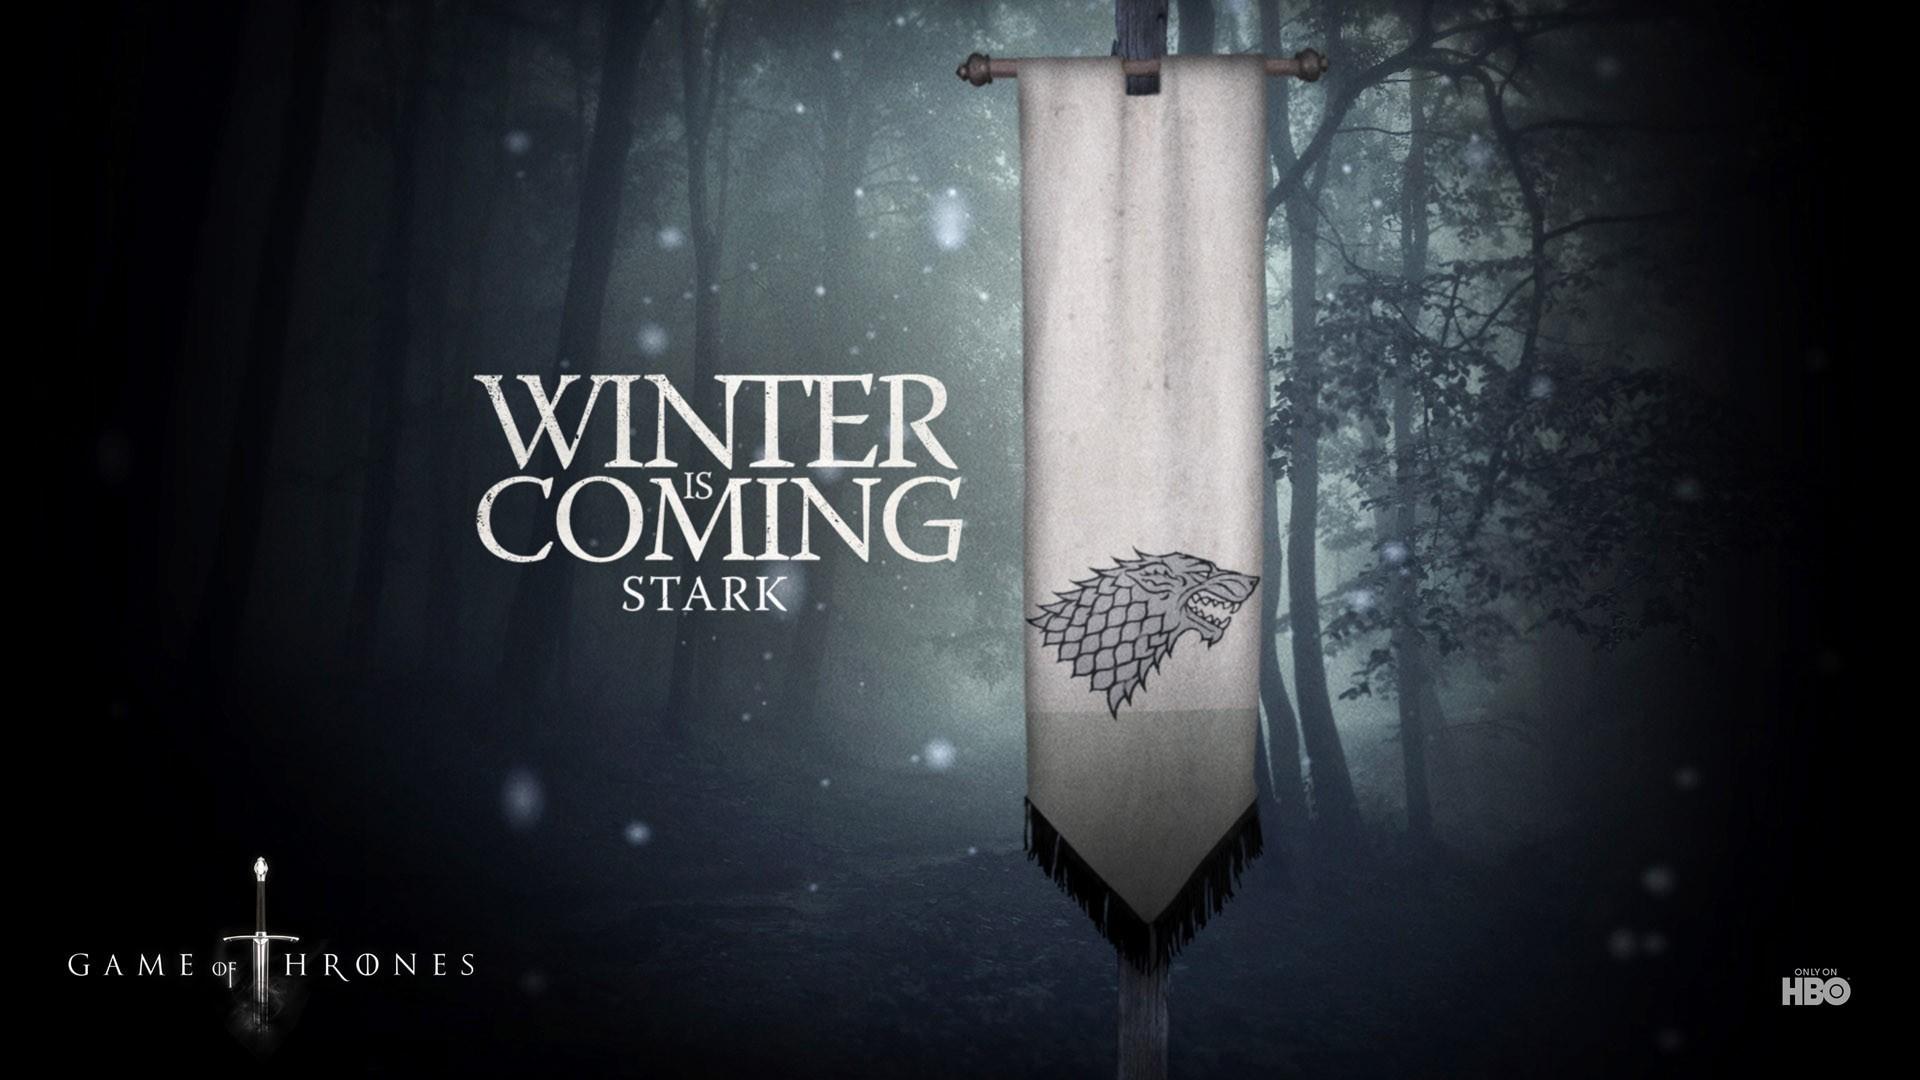 More Movies desktop wallpapers · Direwolf Coat Of Arms Stark House Game Of  Thrones Desktop Wallpaper